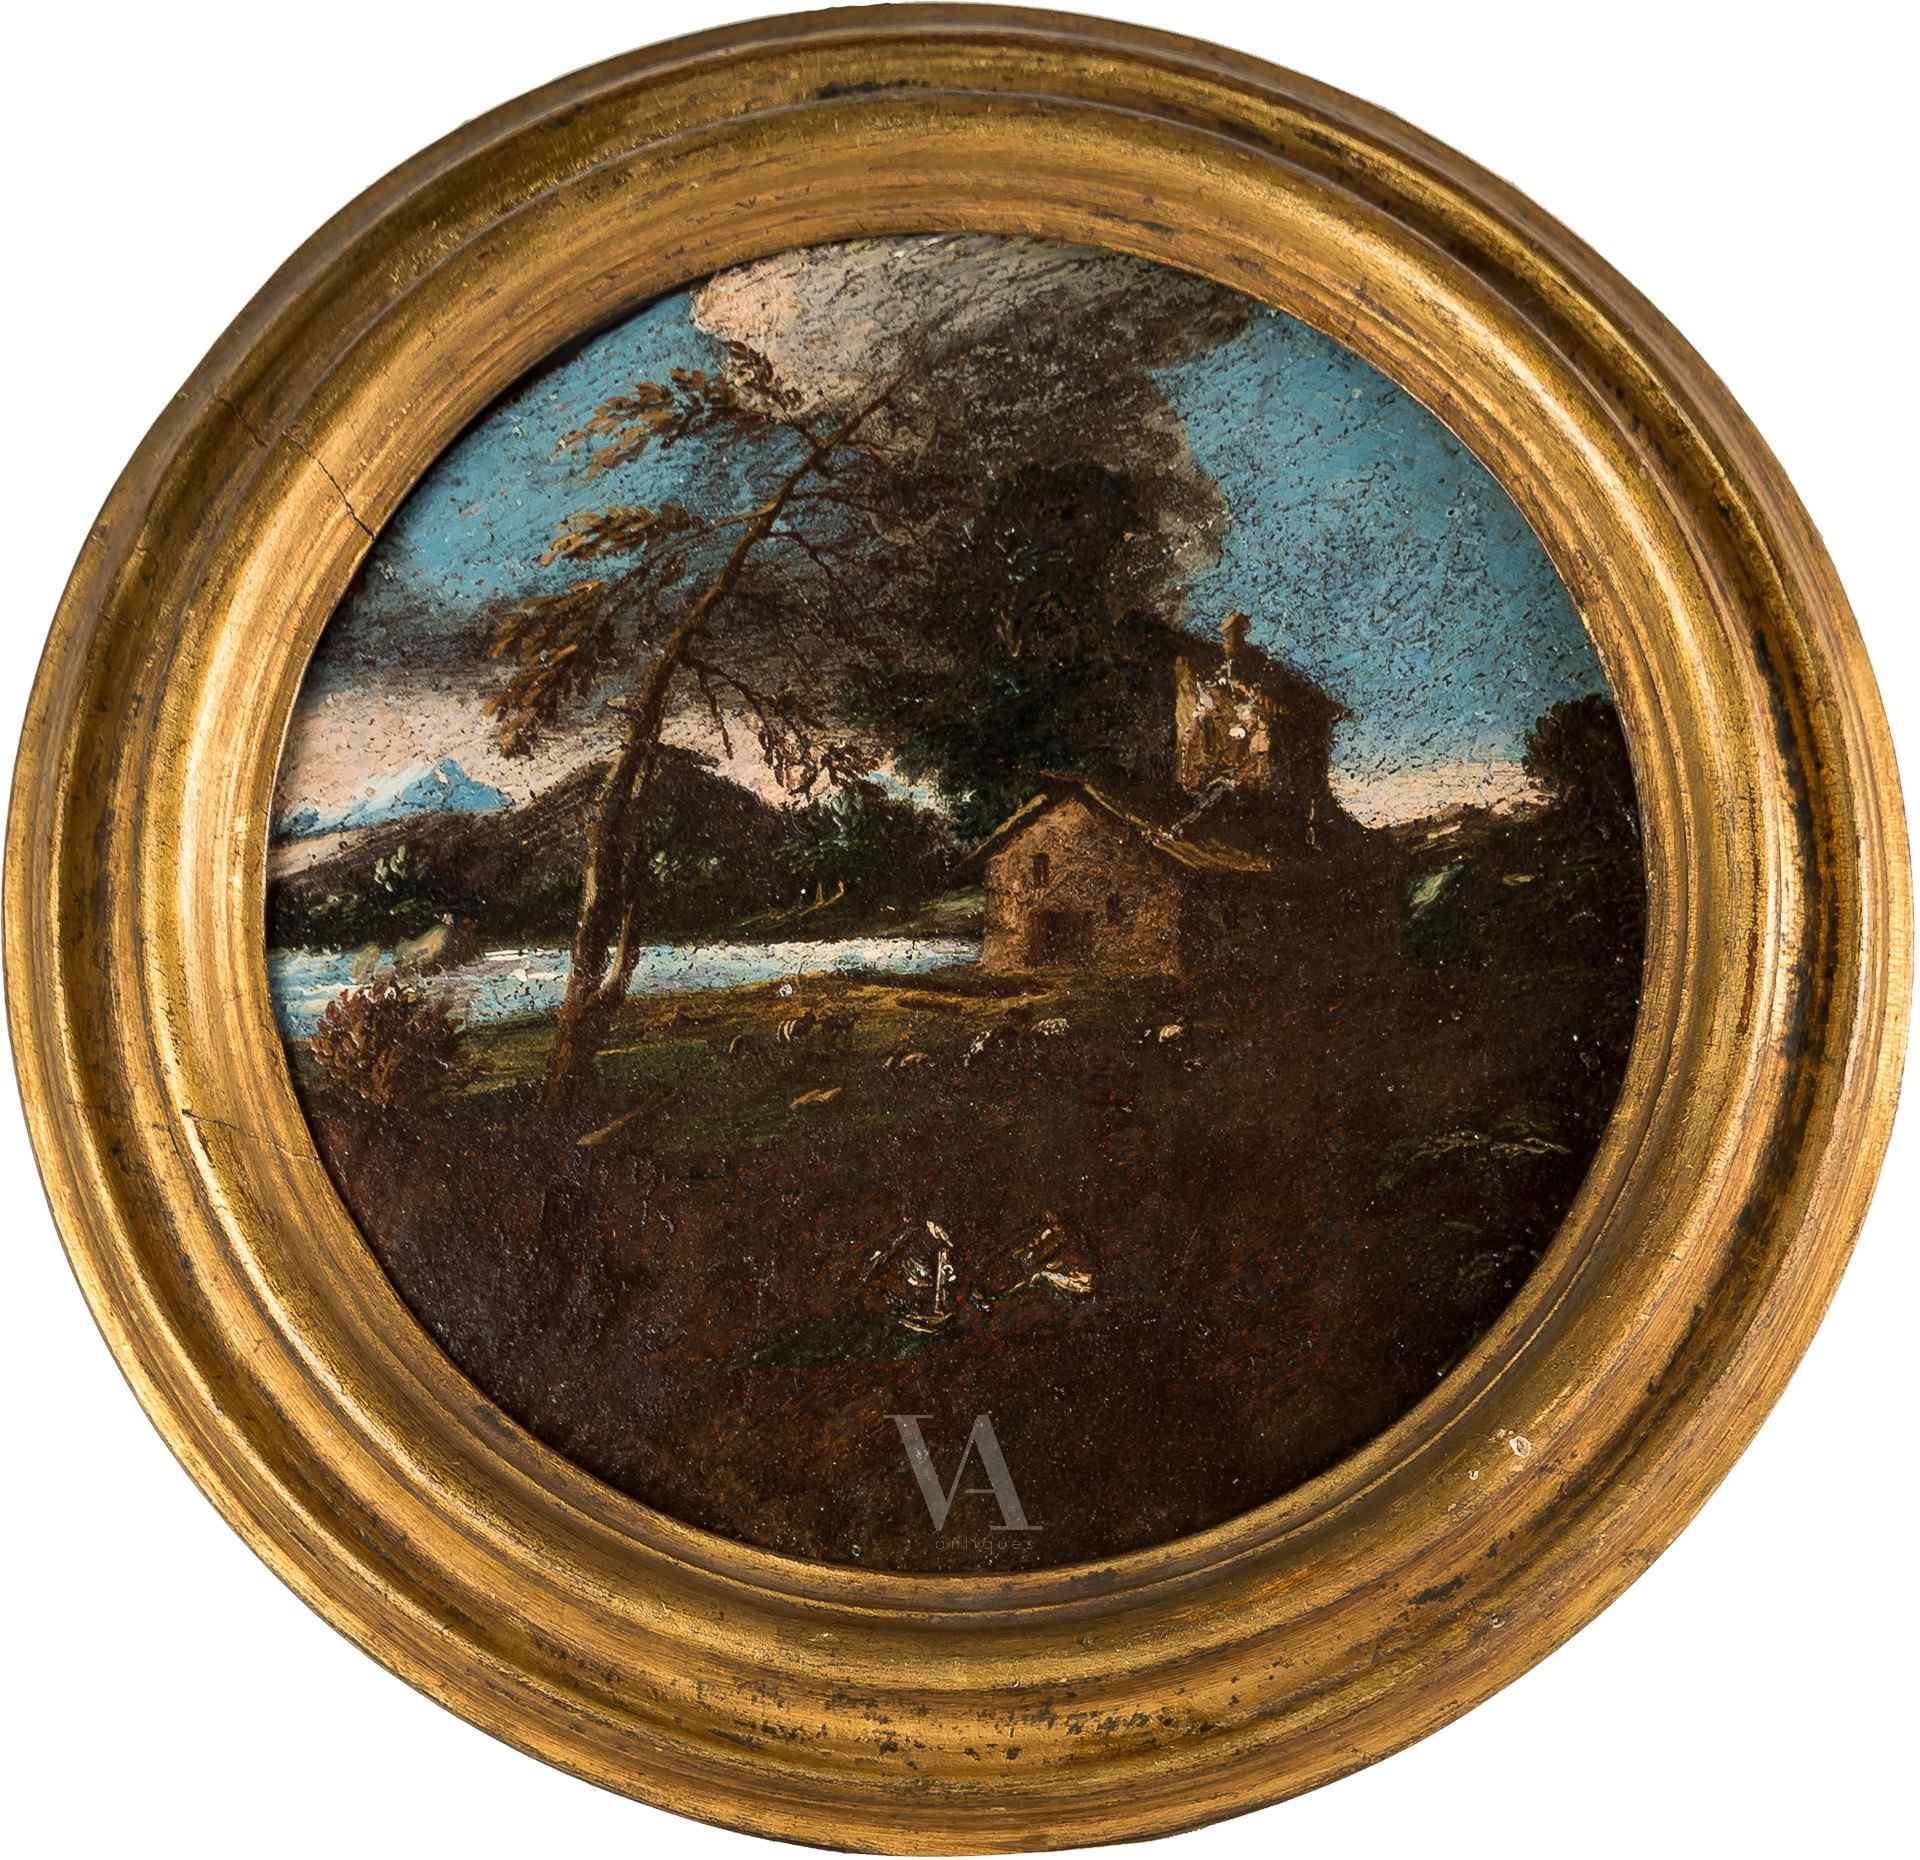 Giuseppe Zola attribué, Paysage rural avec chiffres